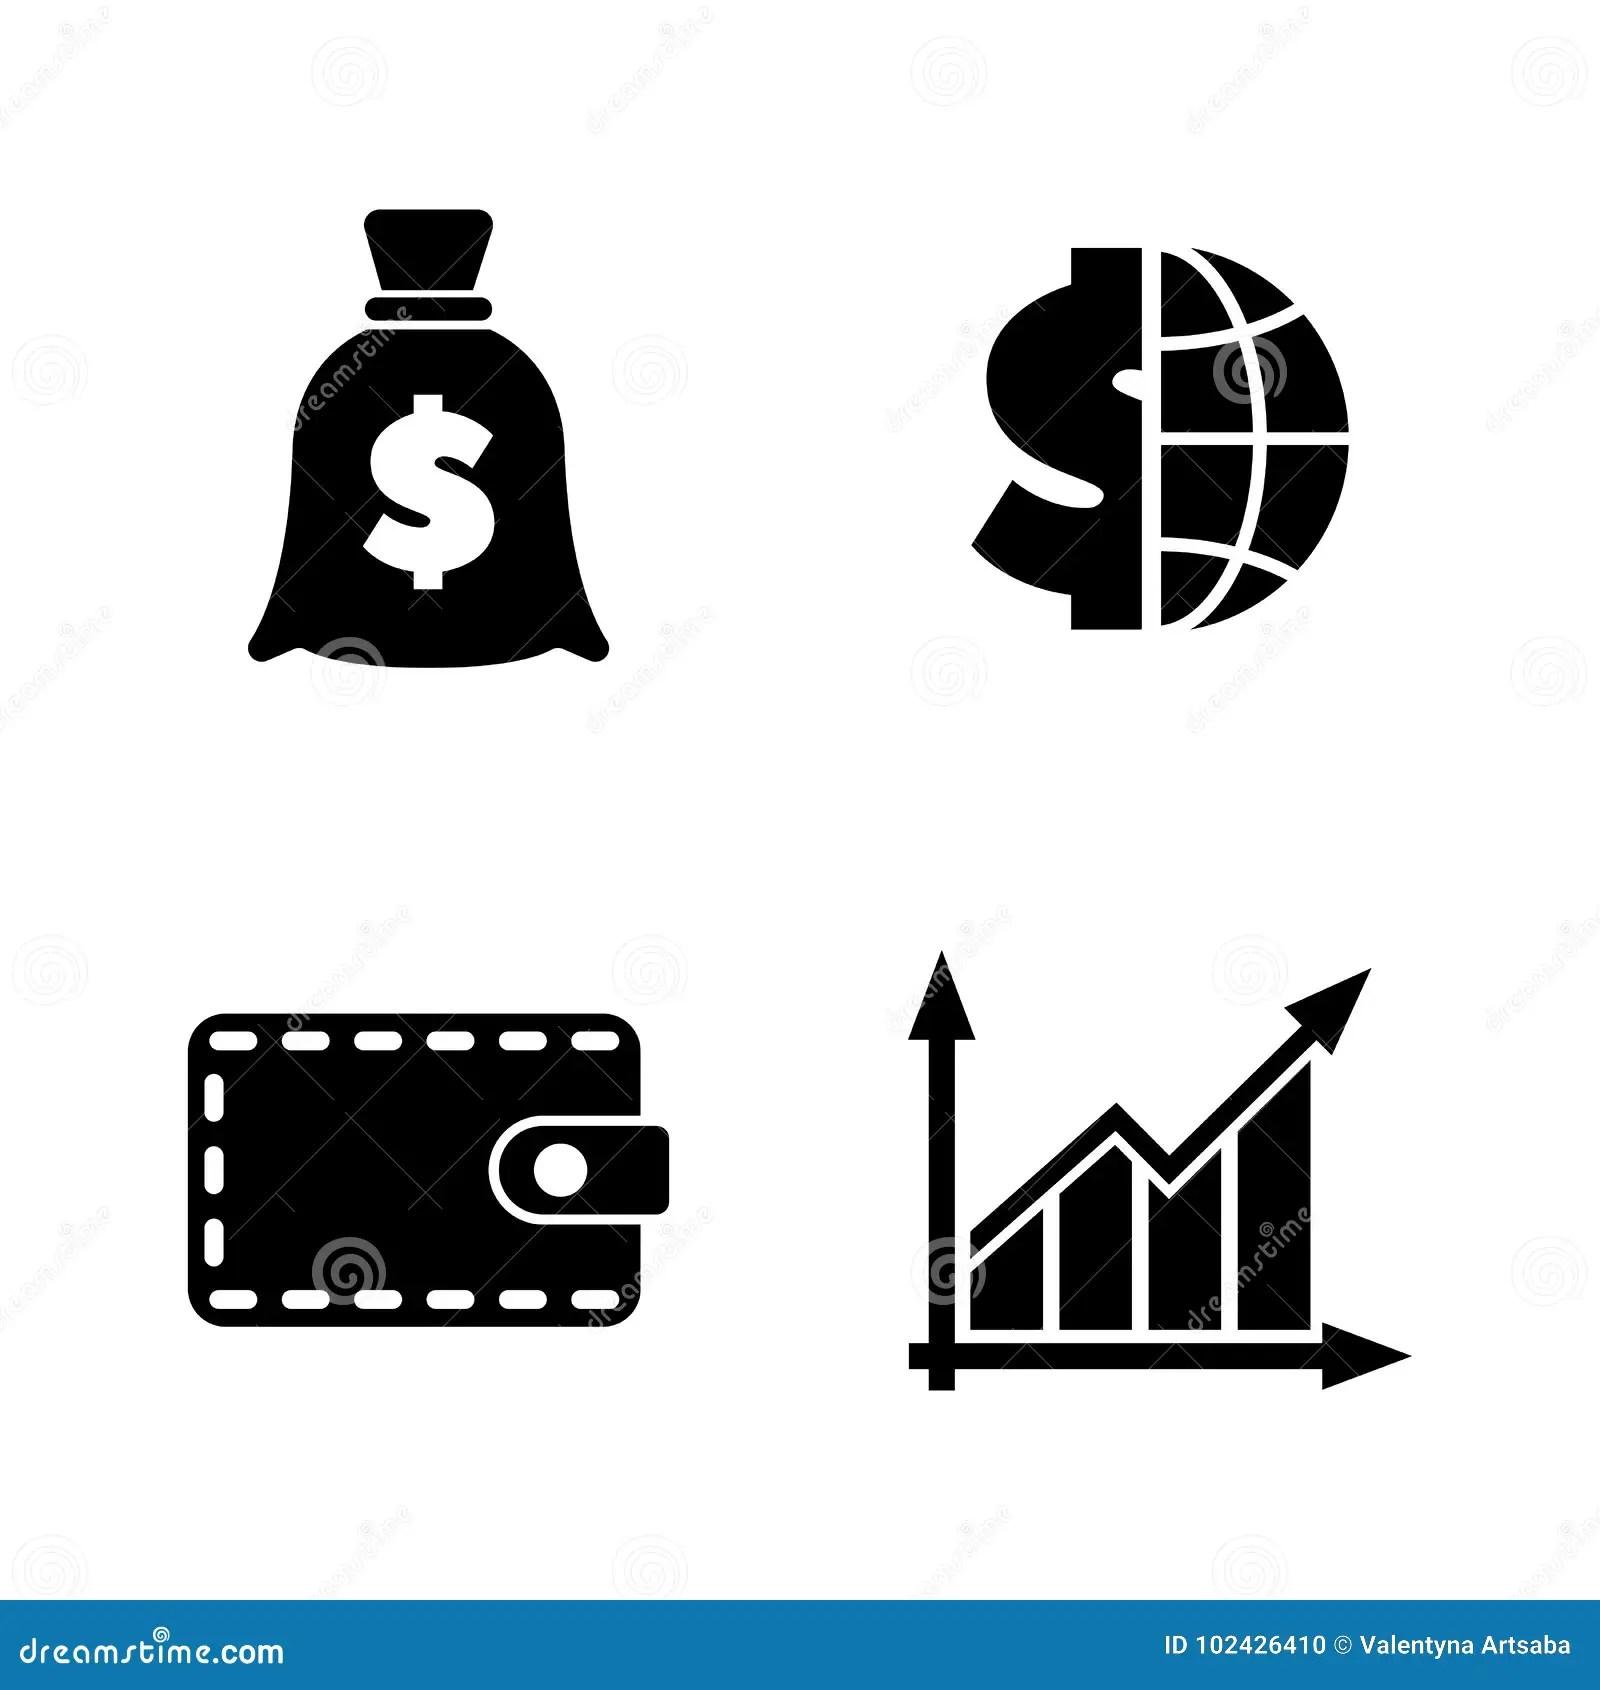 World Market Economy Growth And Increase Stock Photo